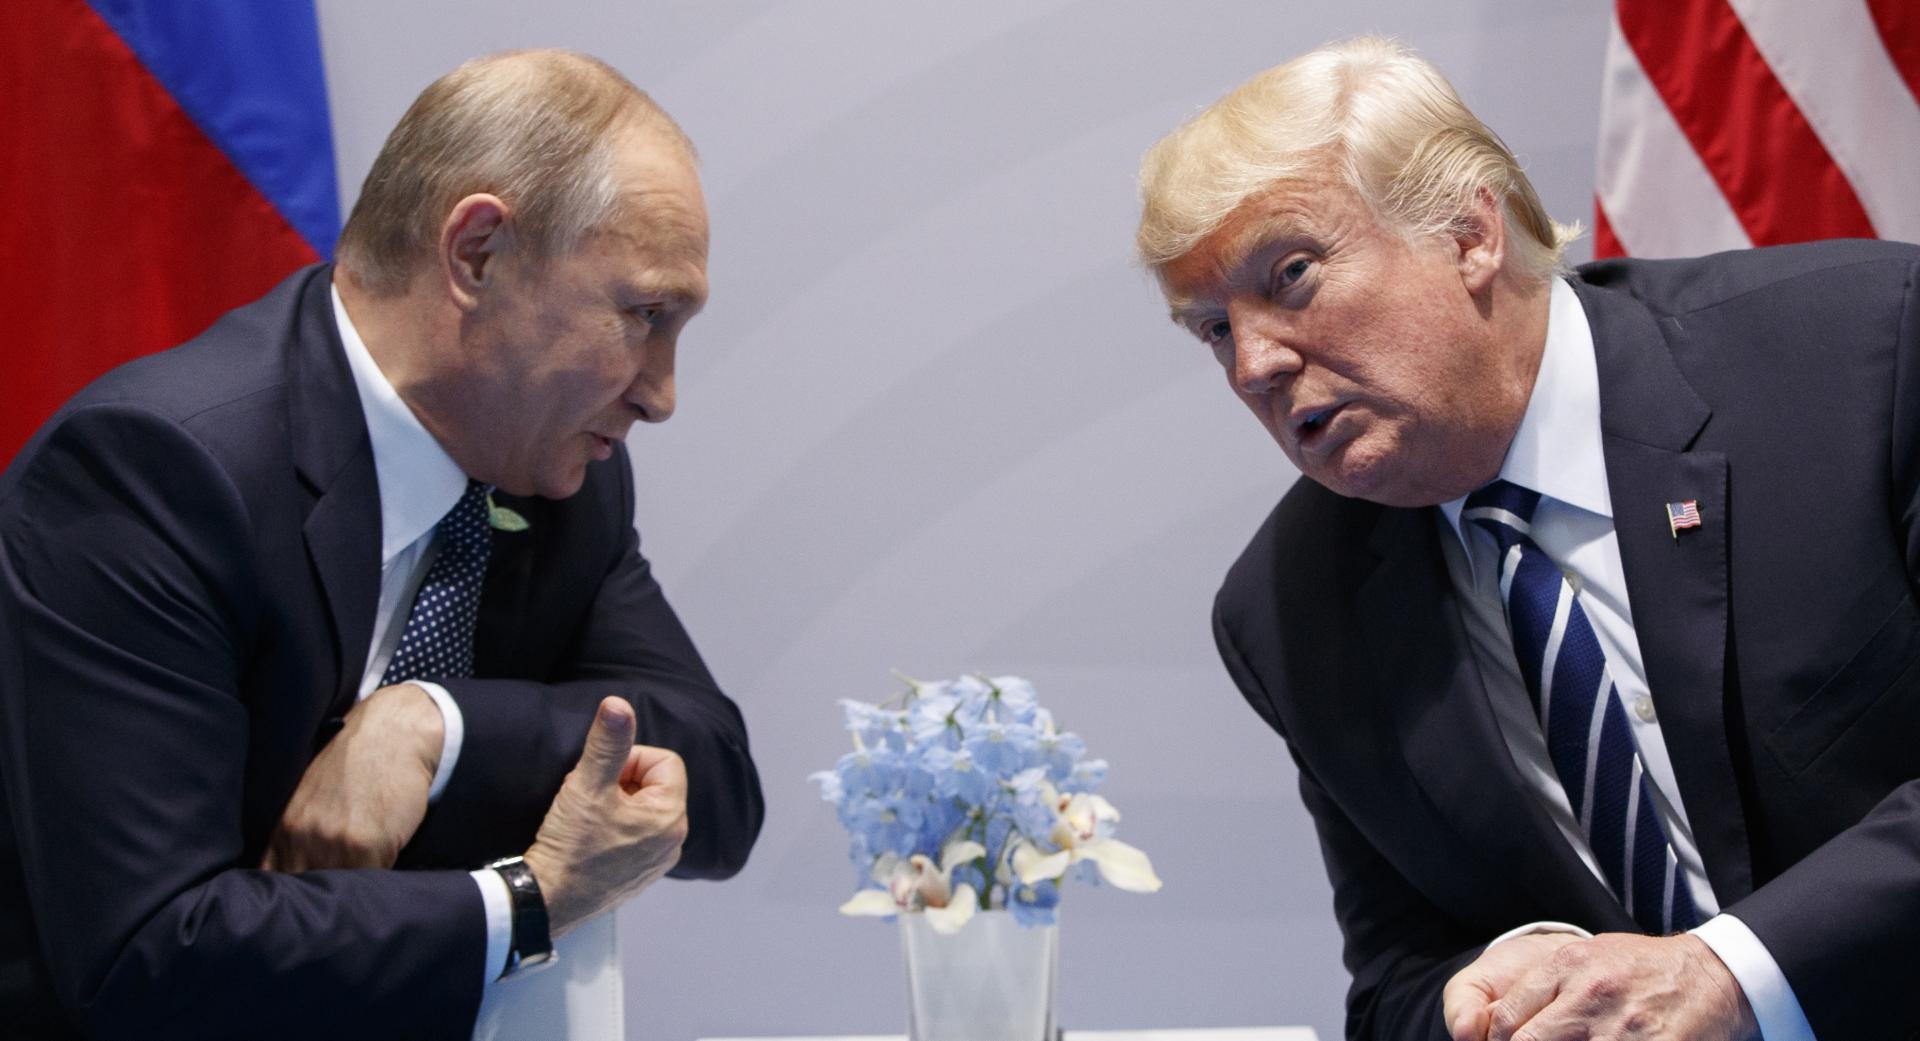 Vladimir Putin și Donald Trump vor avea discuții la Paris